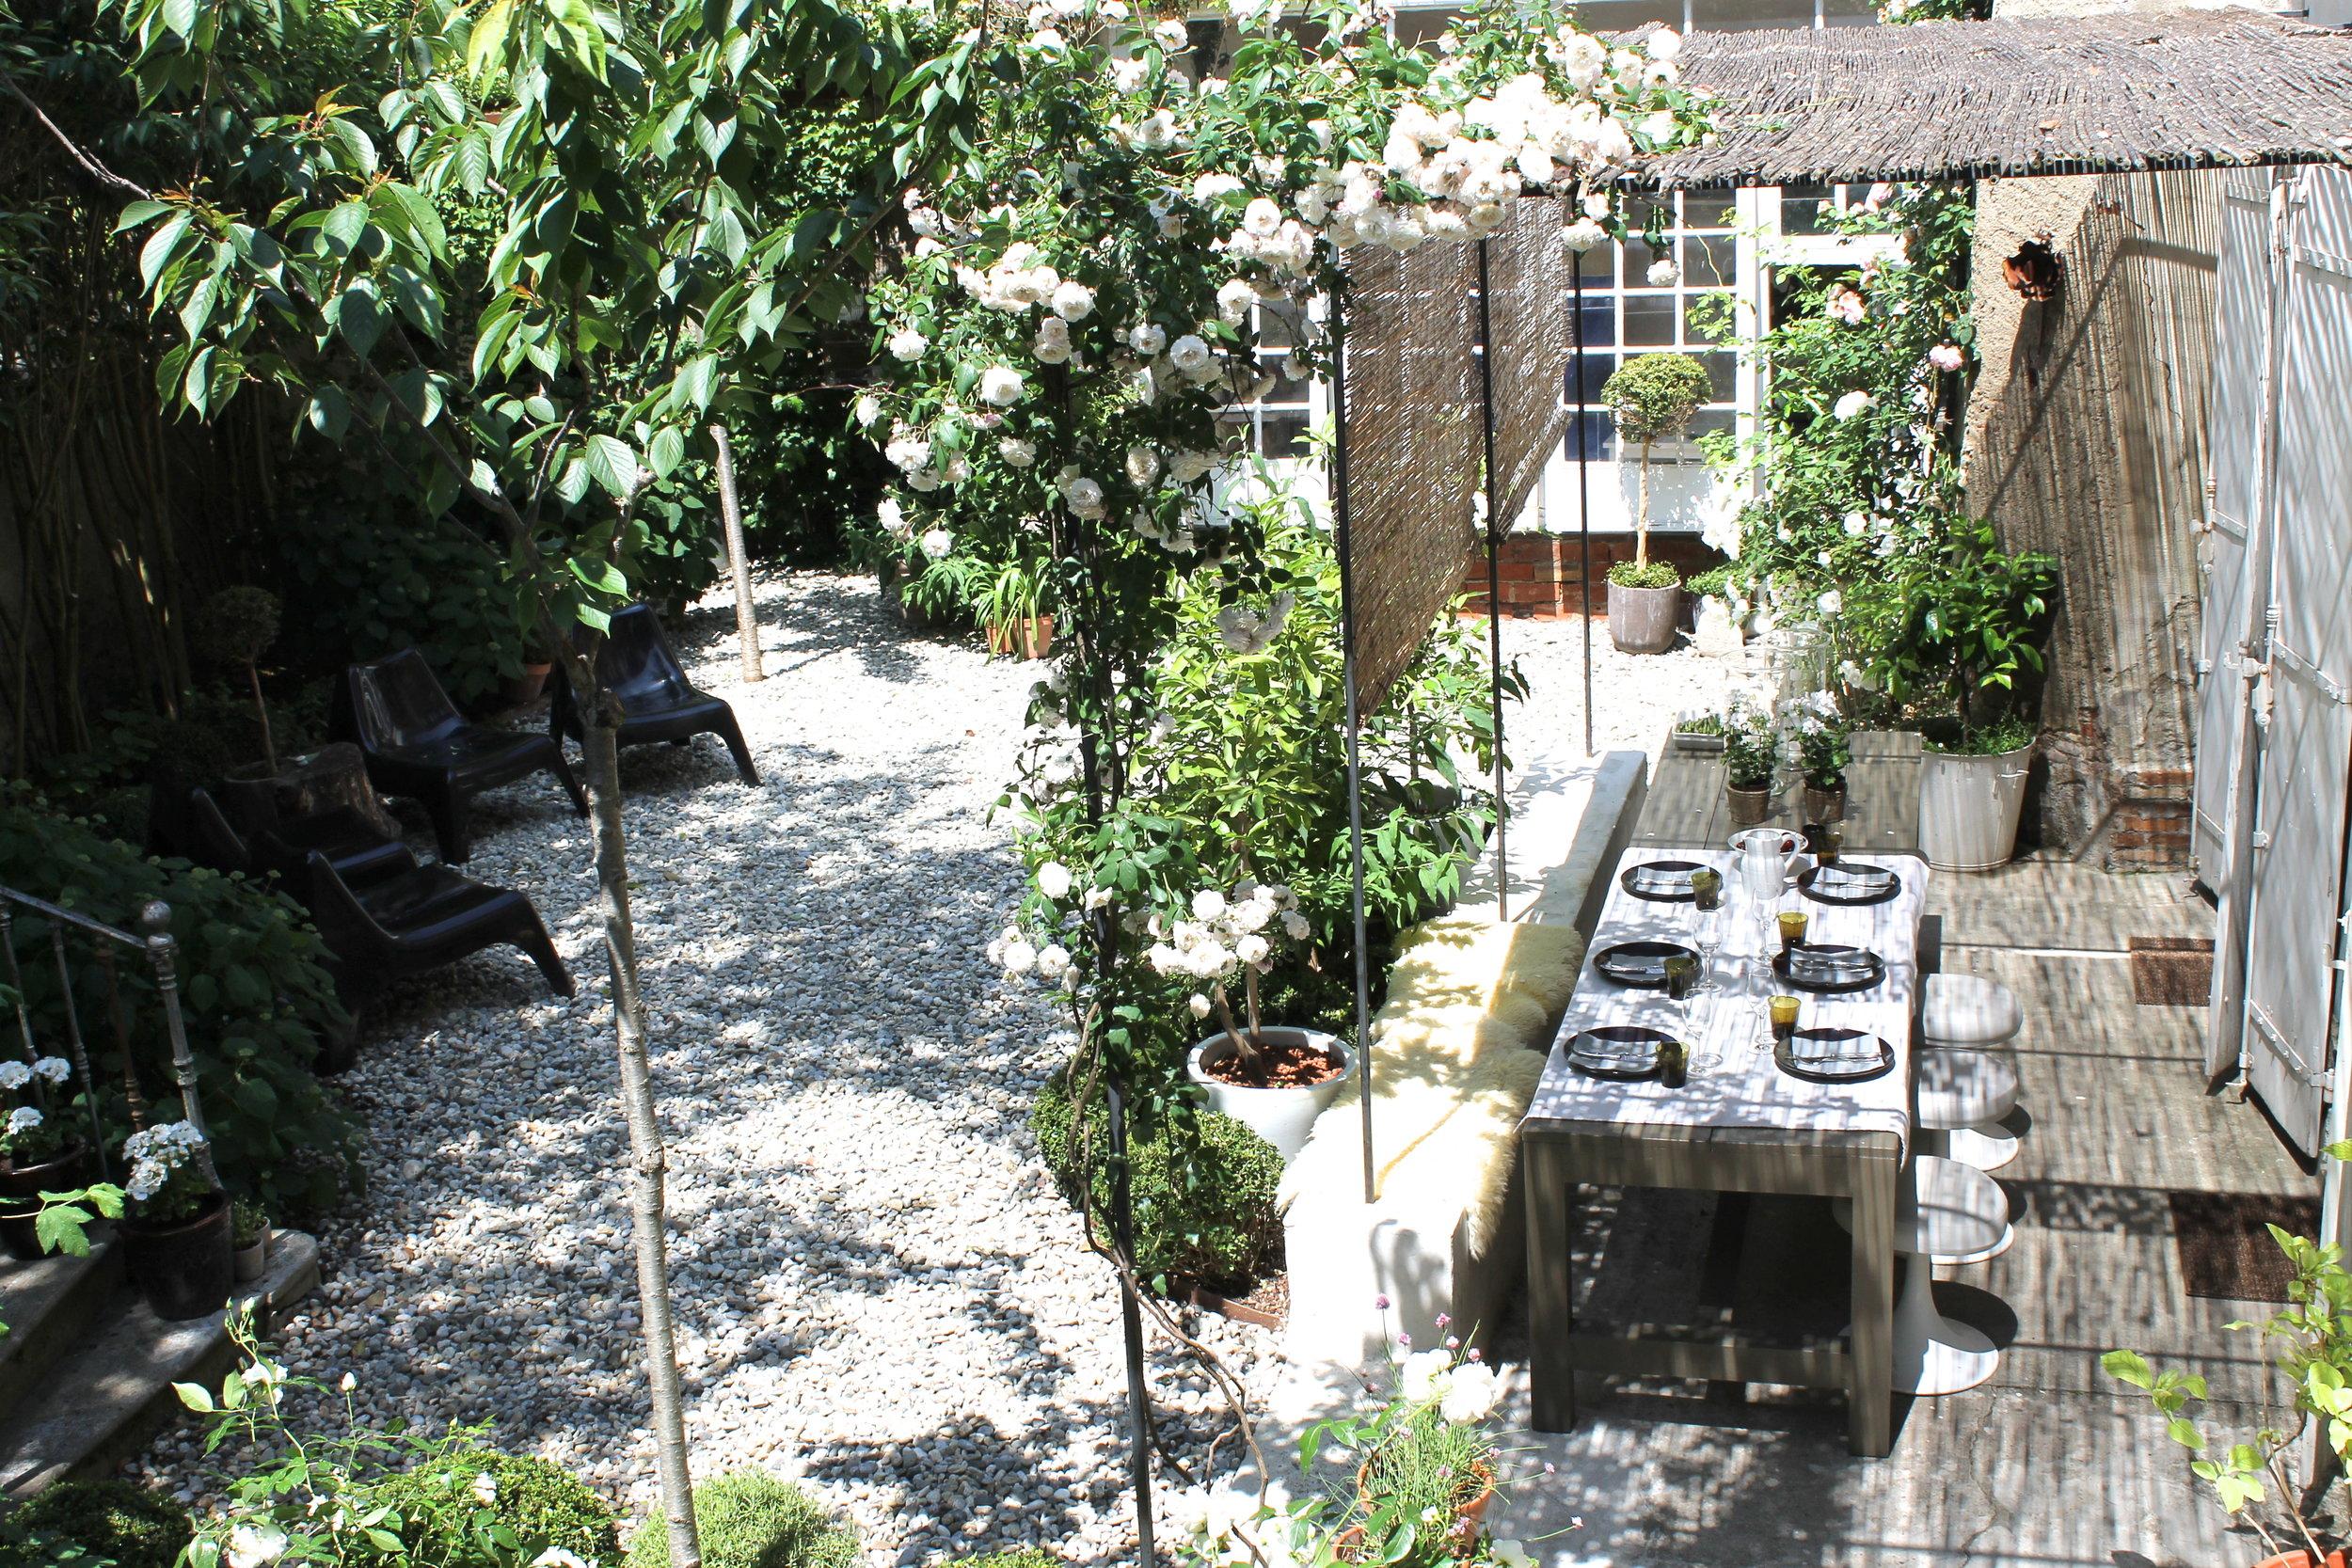 camellas-lloret-maison-d'hotes-outdoor-dining-room.jpg